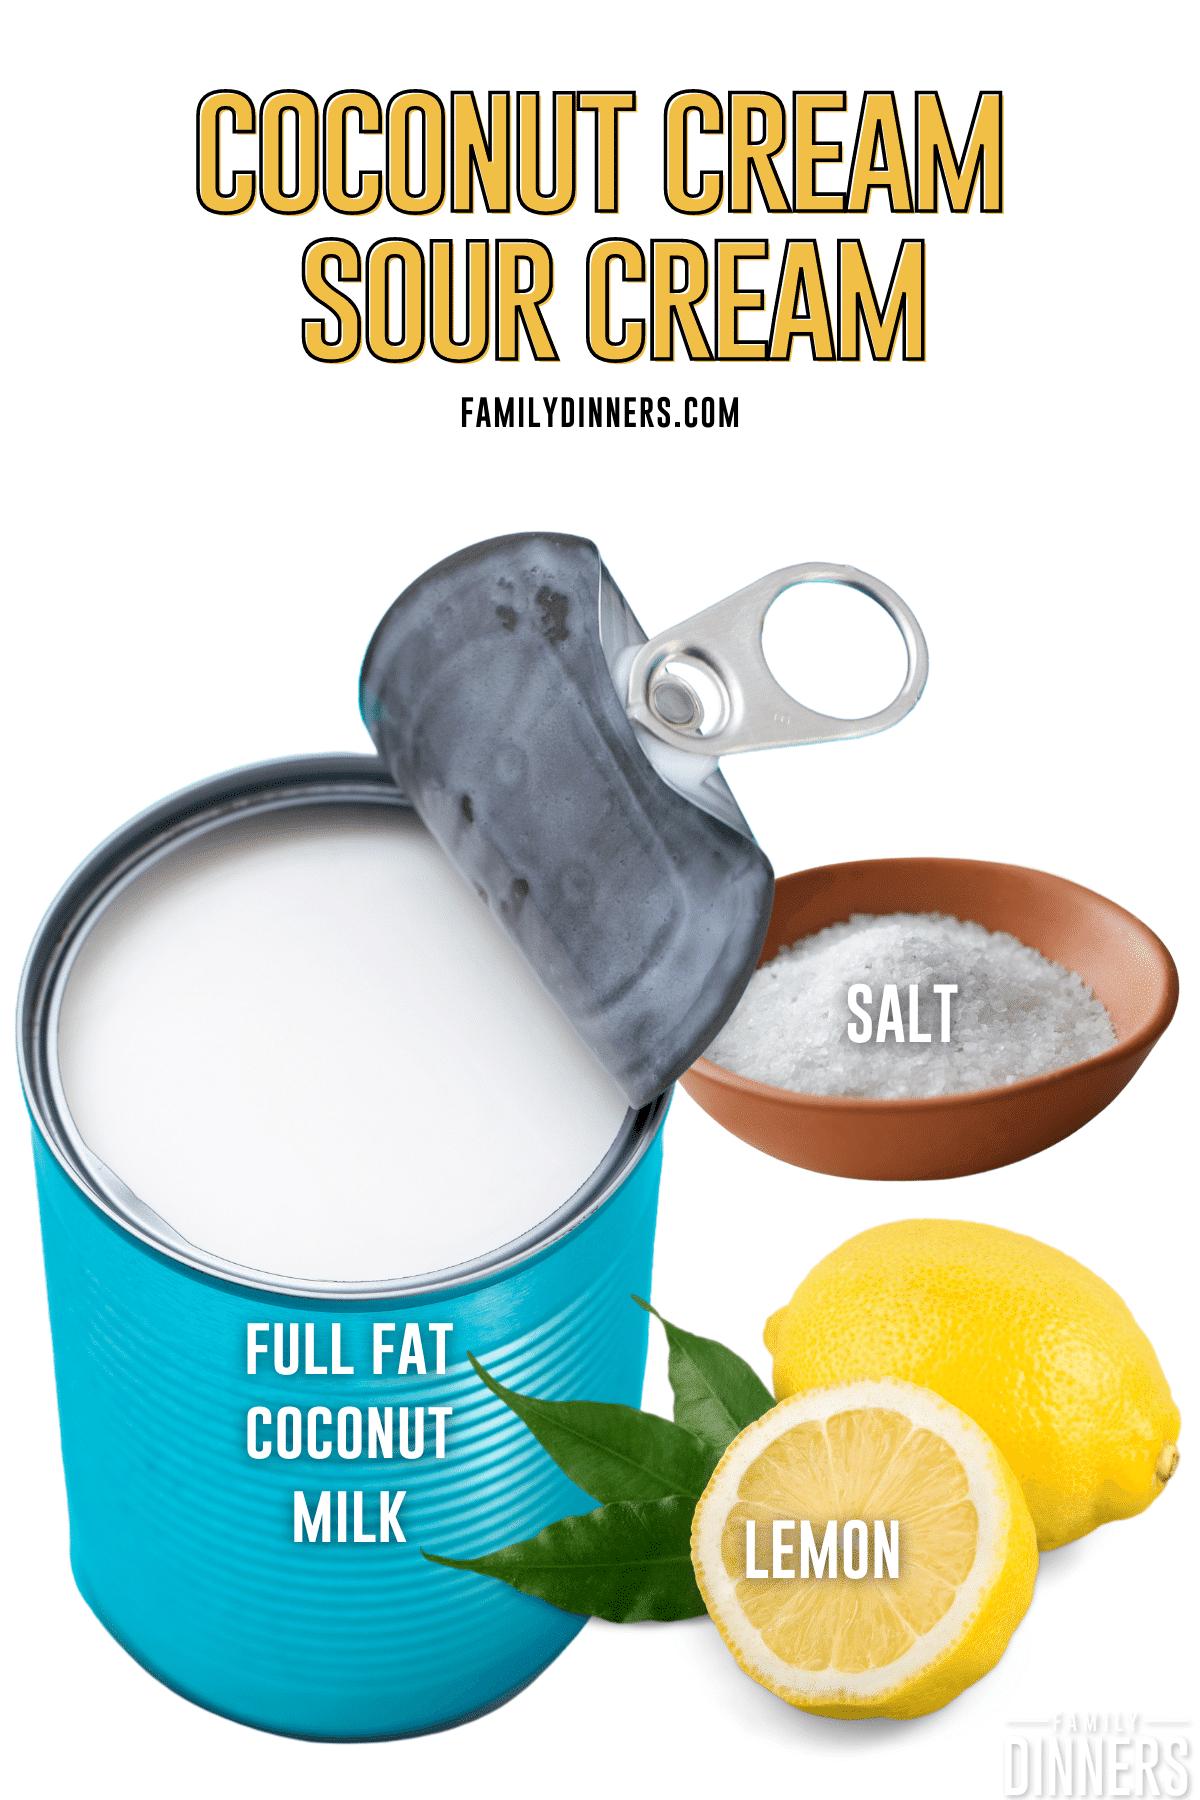 coconut cream sour cream ingredients - can of coconut milk, salt, lemon